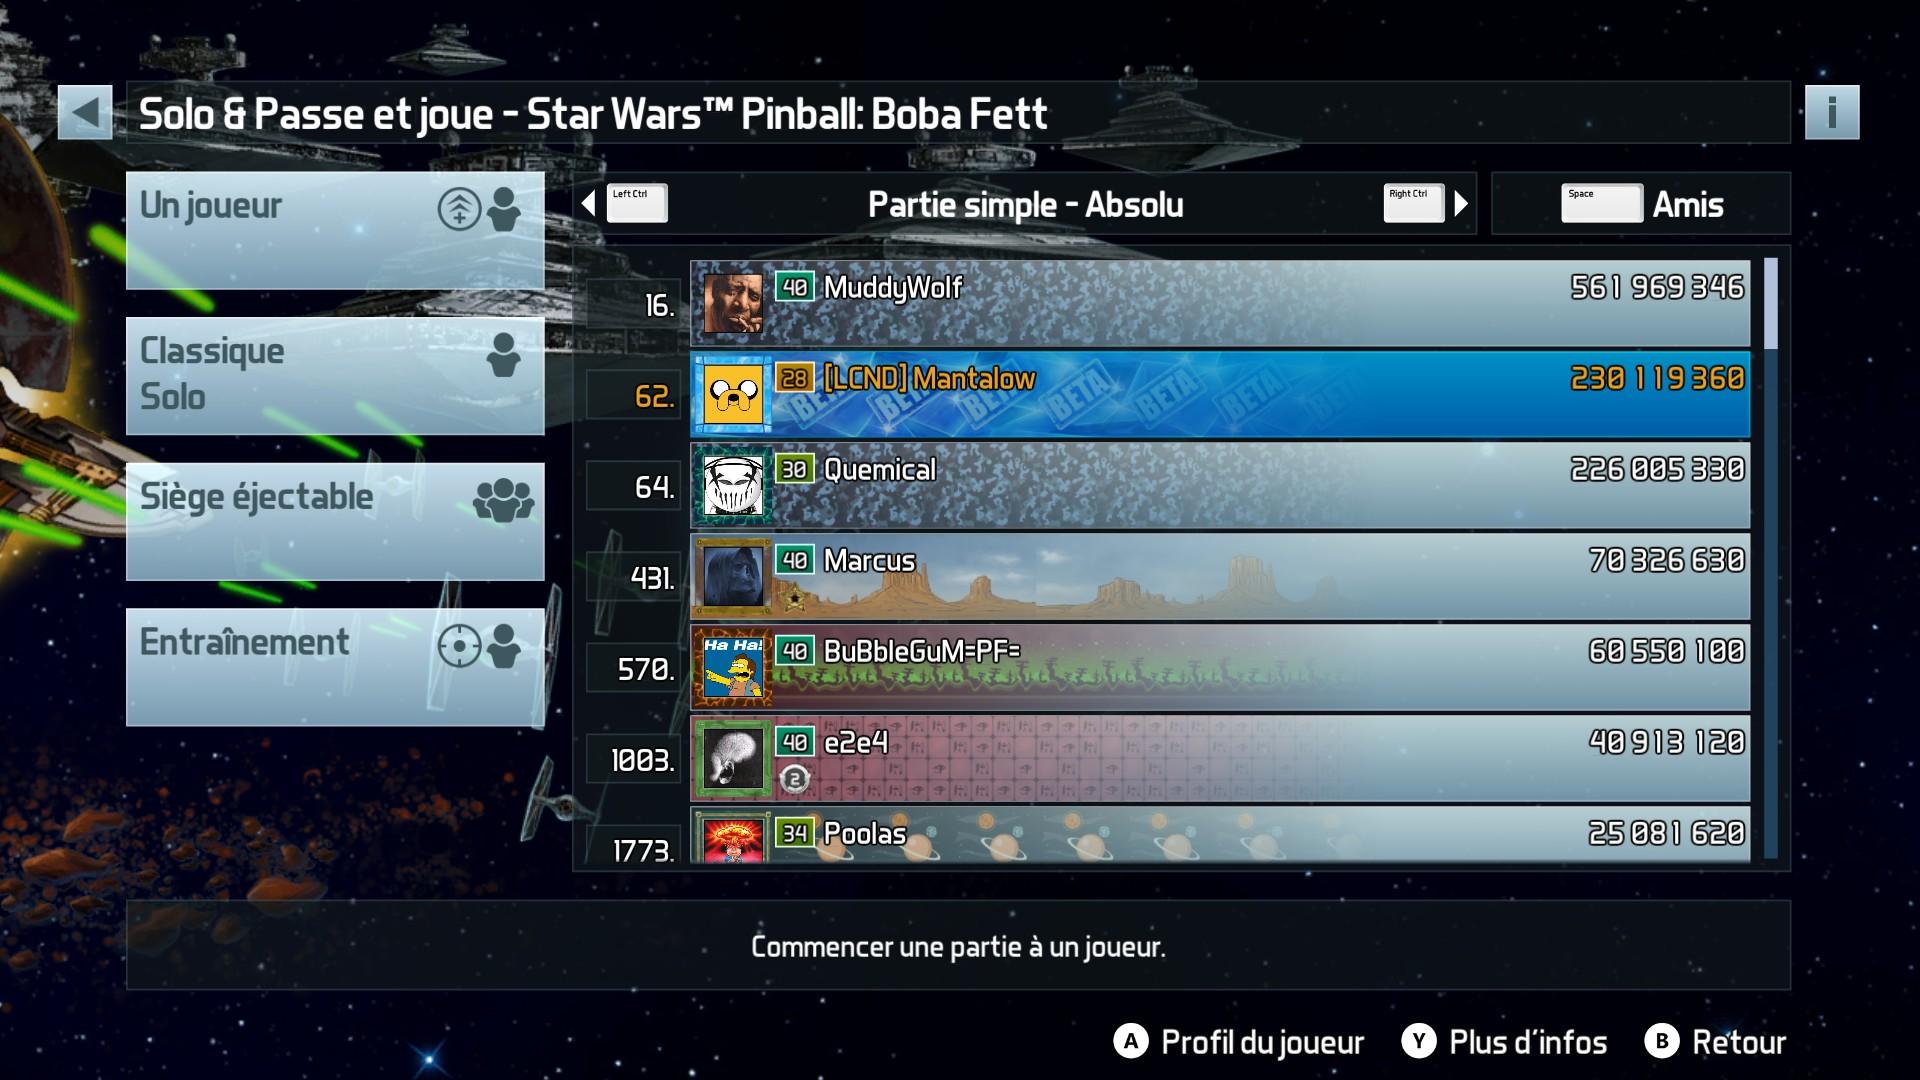 Mantalow: Pinball FX3: Star Wars Pinball: Boba Fett (PC) 230,119,360 points on 2017-12-19 10:49:31